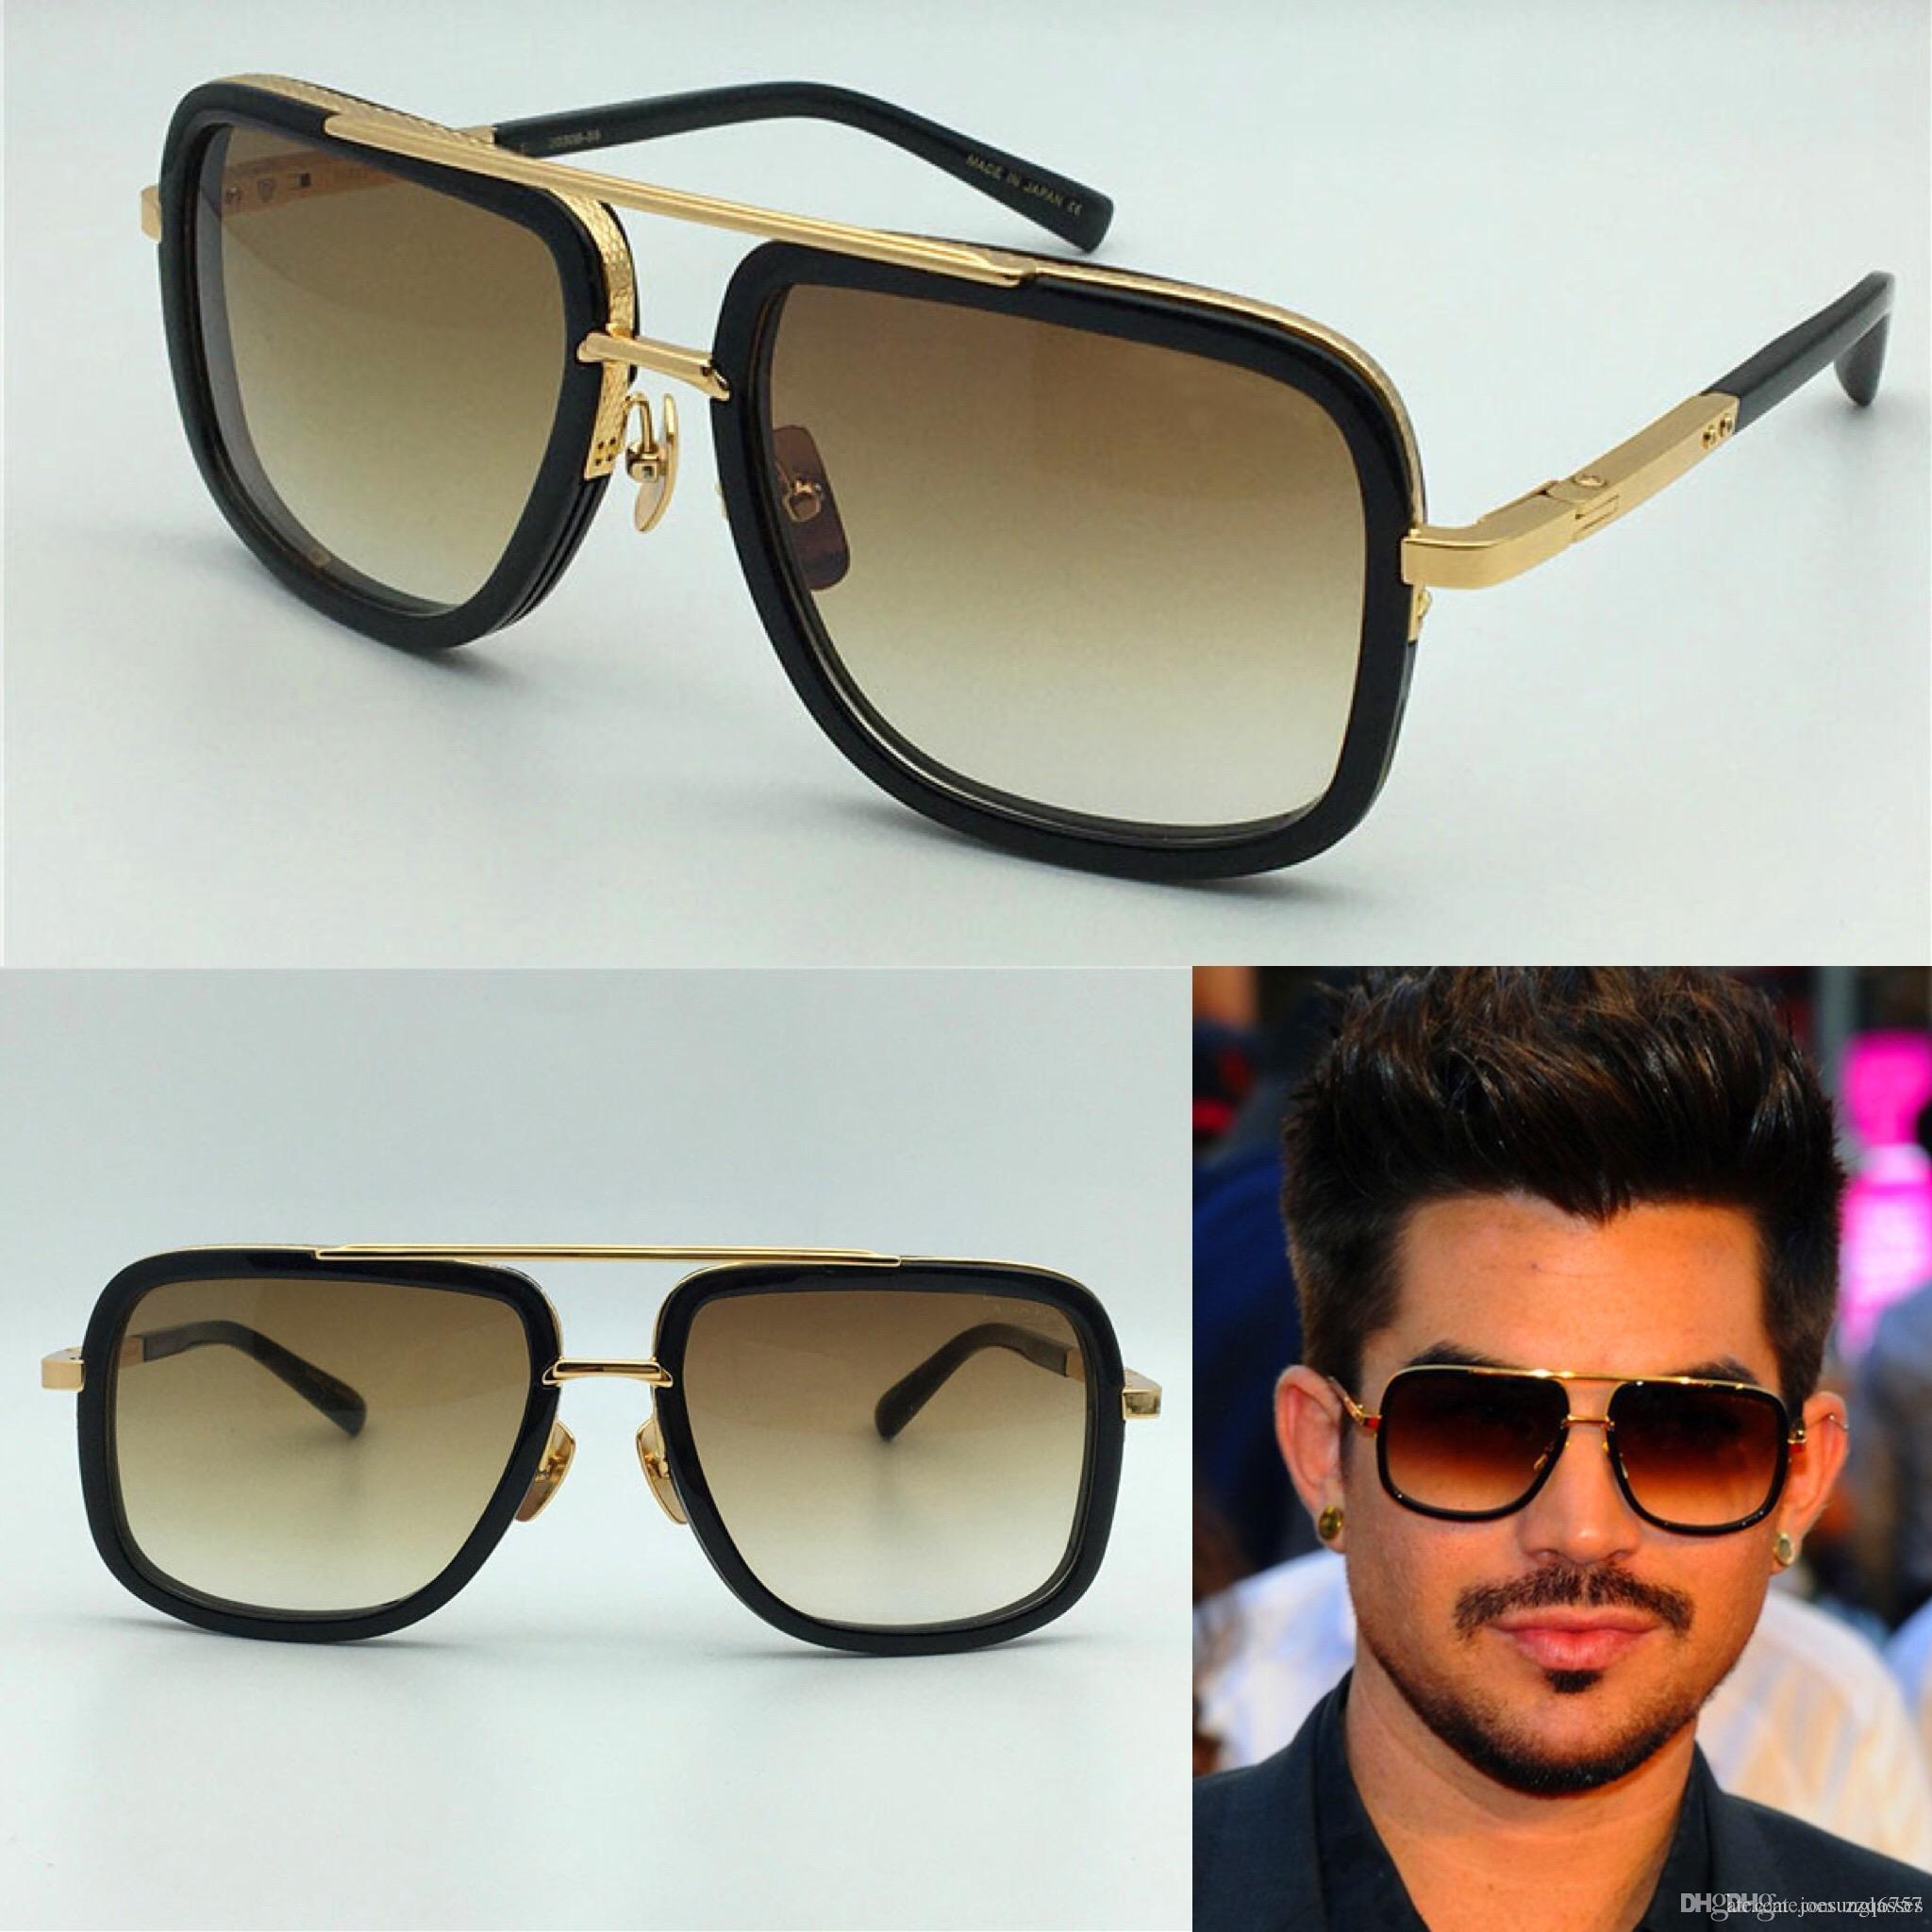 712cd248c8 Hot New Men Brand Designer Sunglasses Titanium Sunglasses Gold Plated  Vintage Retro Style Square Frame UV400 Lens Original Case Circle Sunglasses  Glass ...